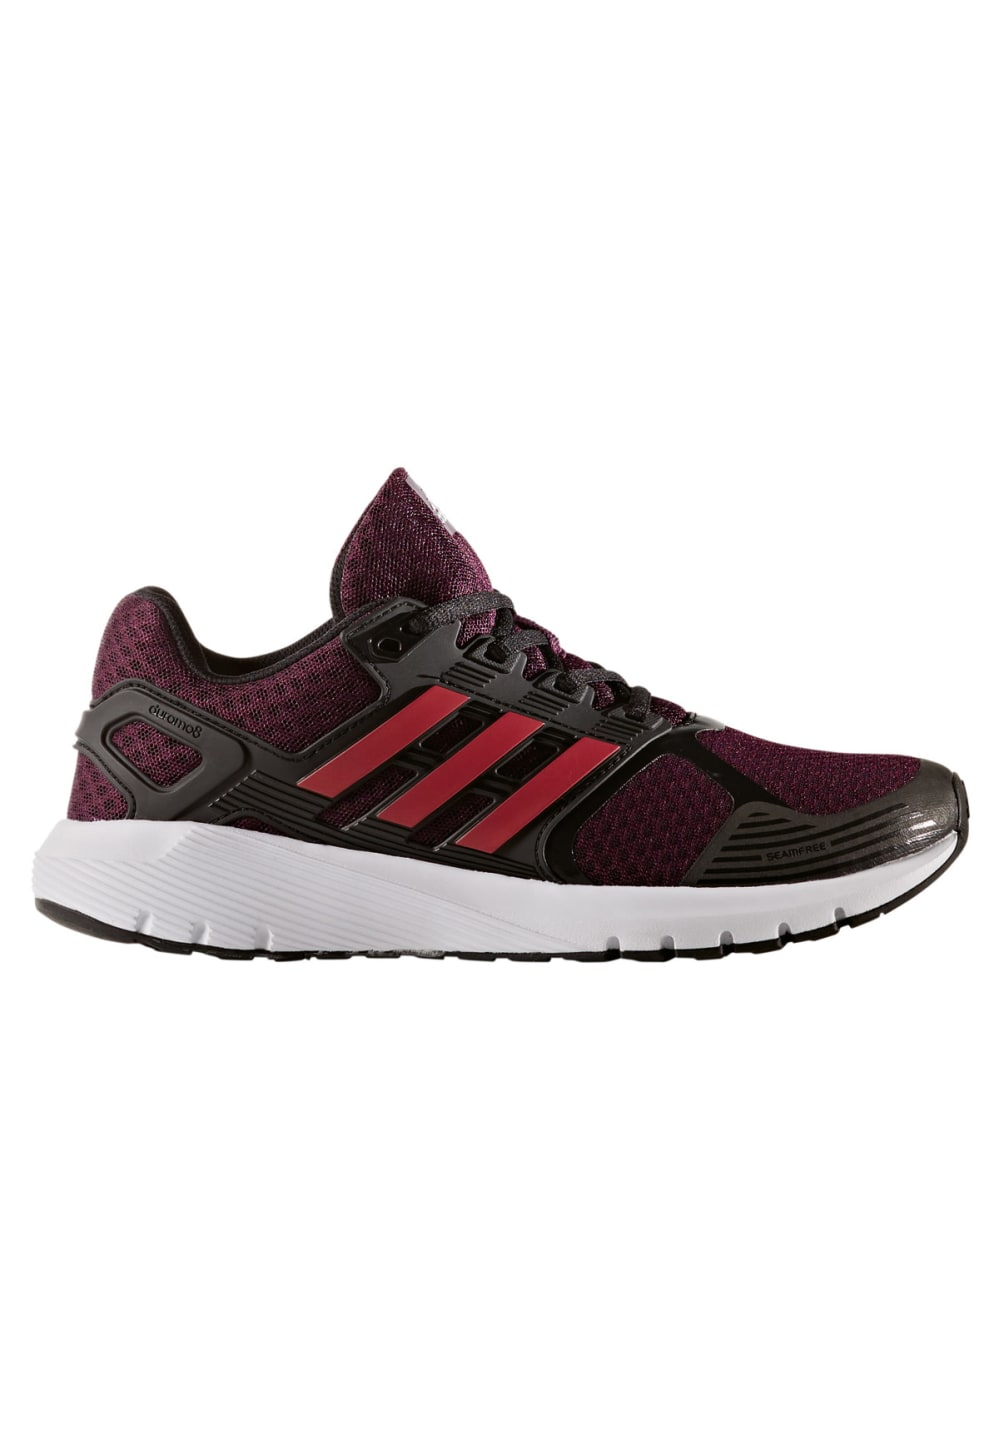 superior quality 76c9b 677ad Next. -60%. adidas. Duramo 8 - Chaussures running pour Femme